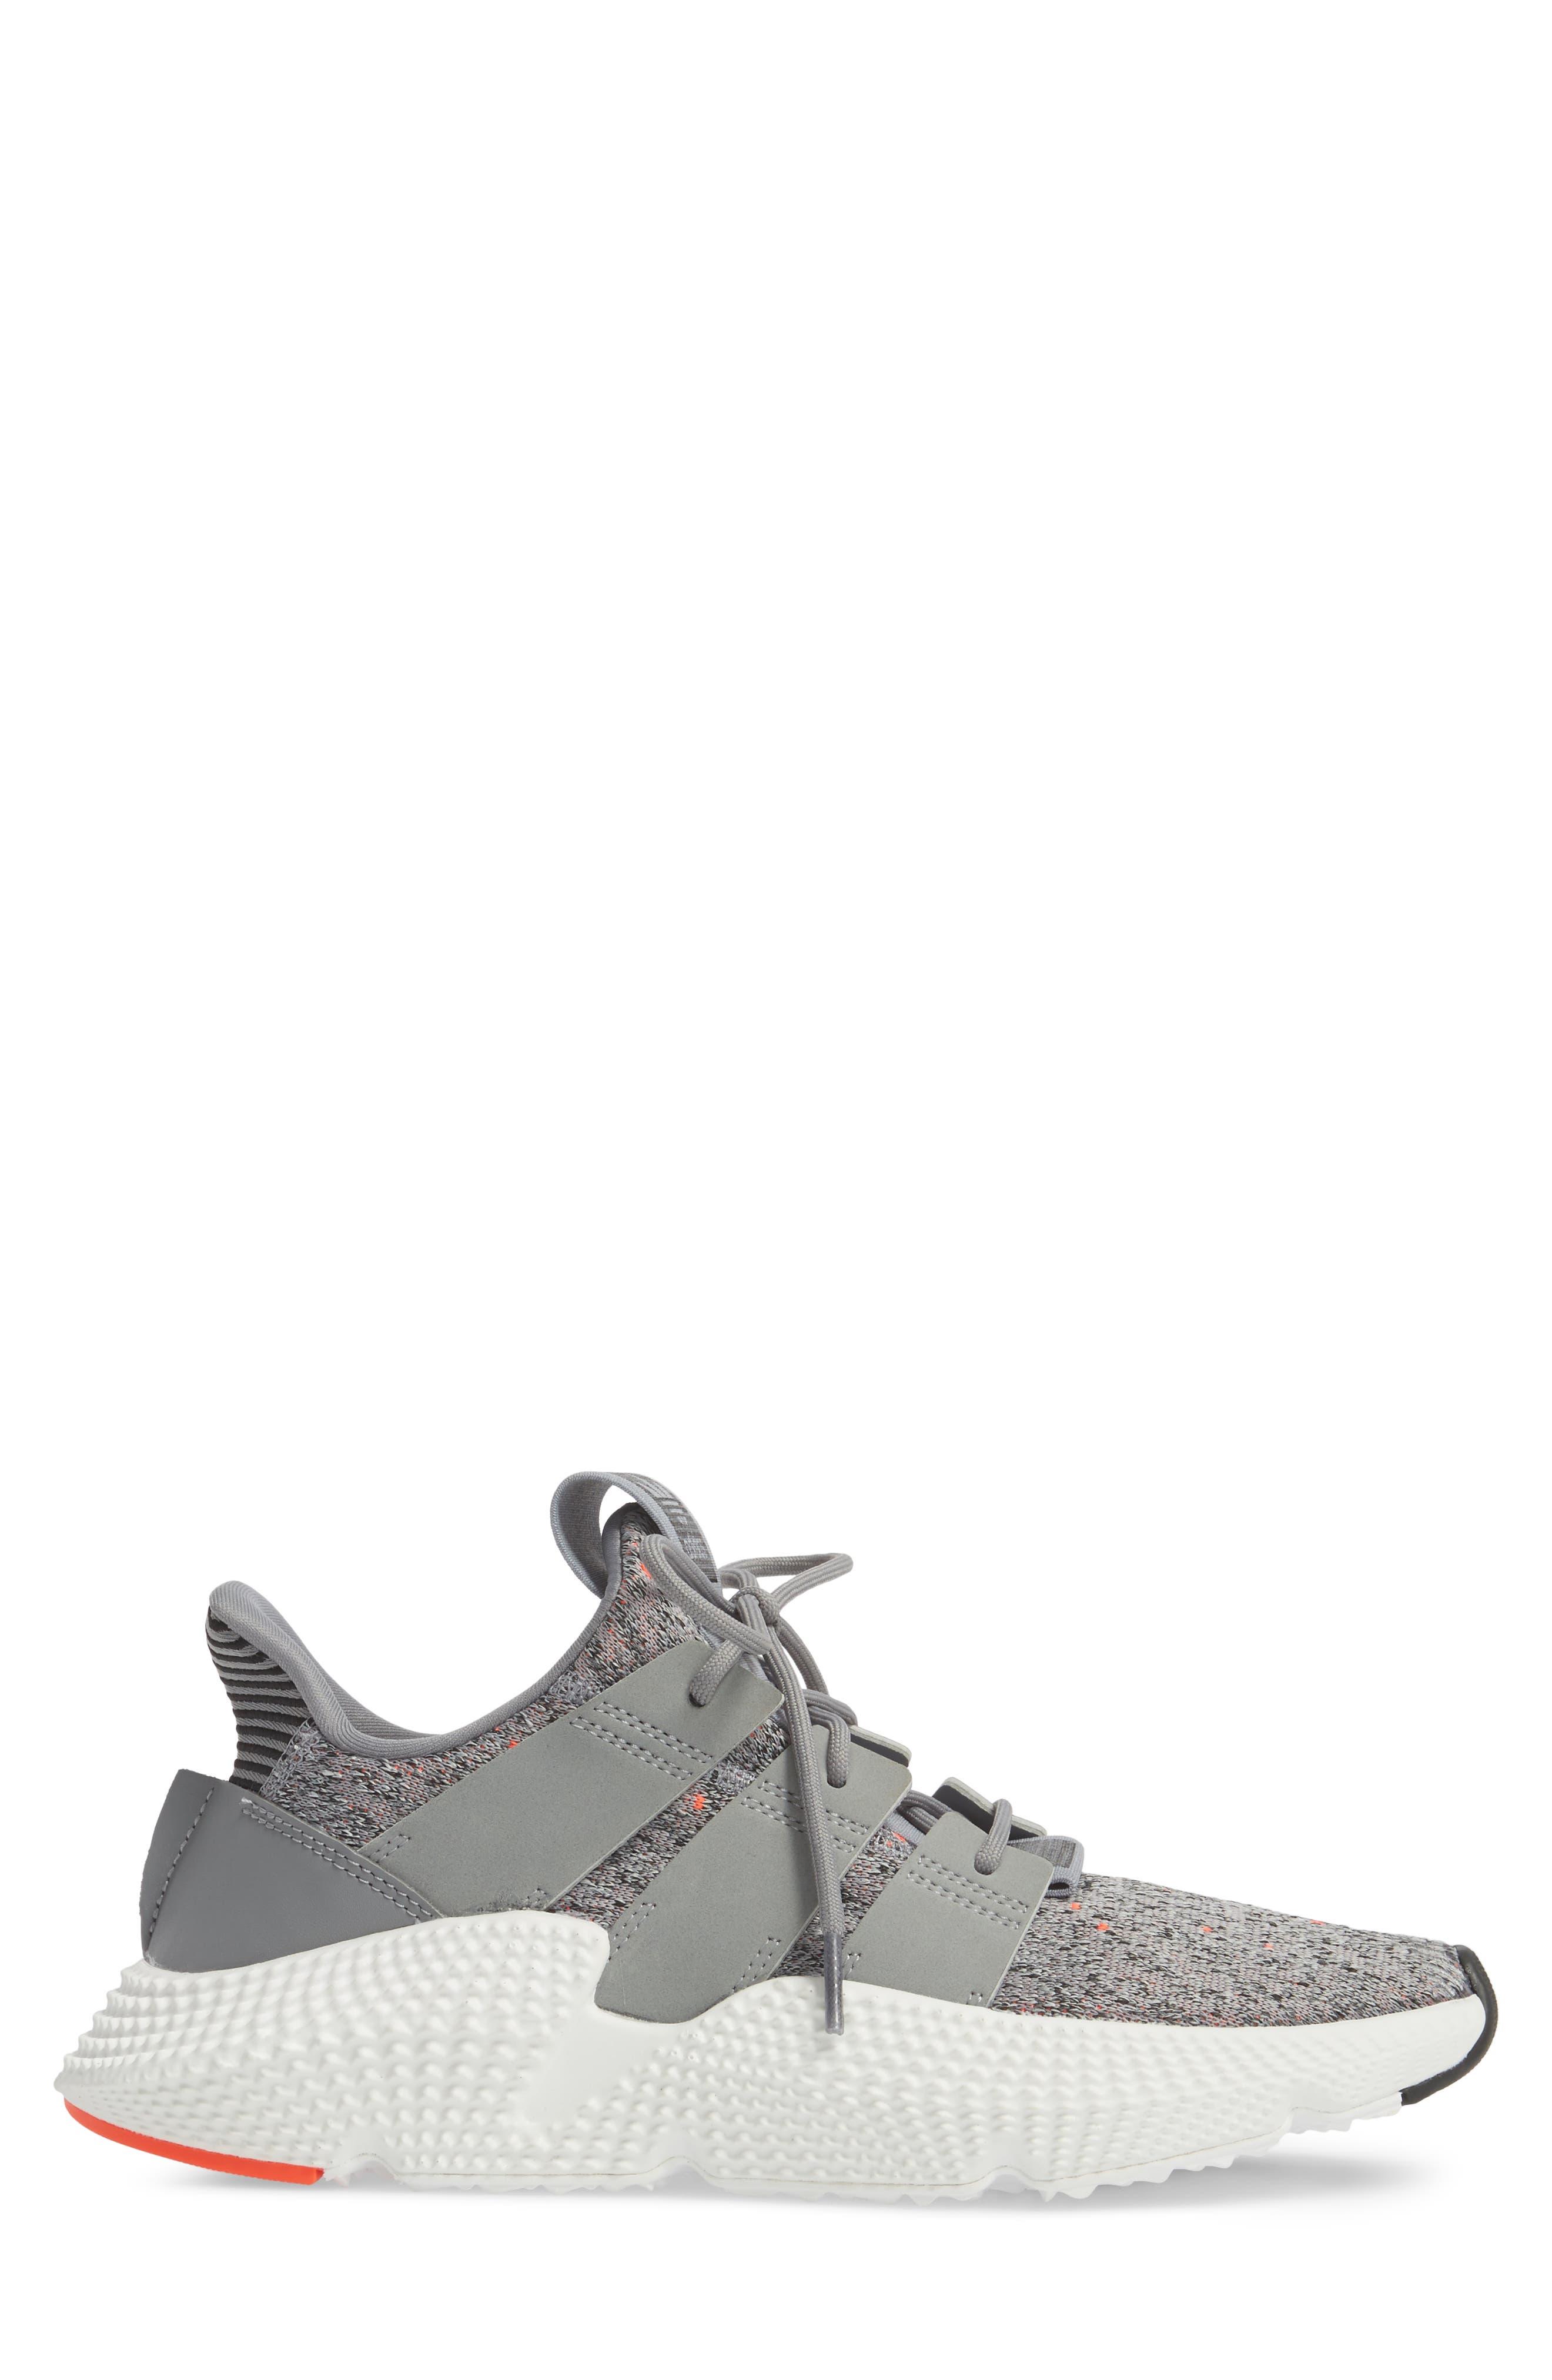 Prophere Sneaker,                             Alternate thumbnail 3, color,                             Grey/ White/ Solar Red